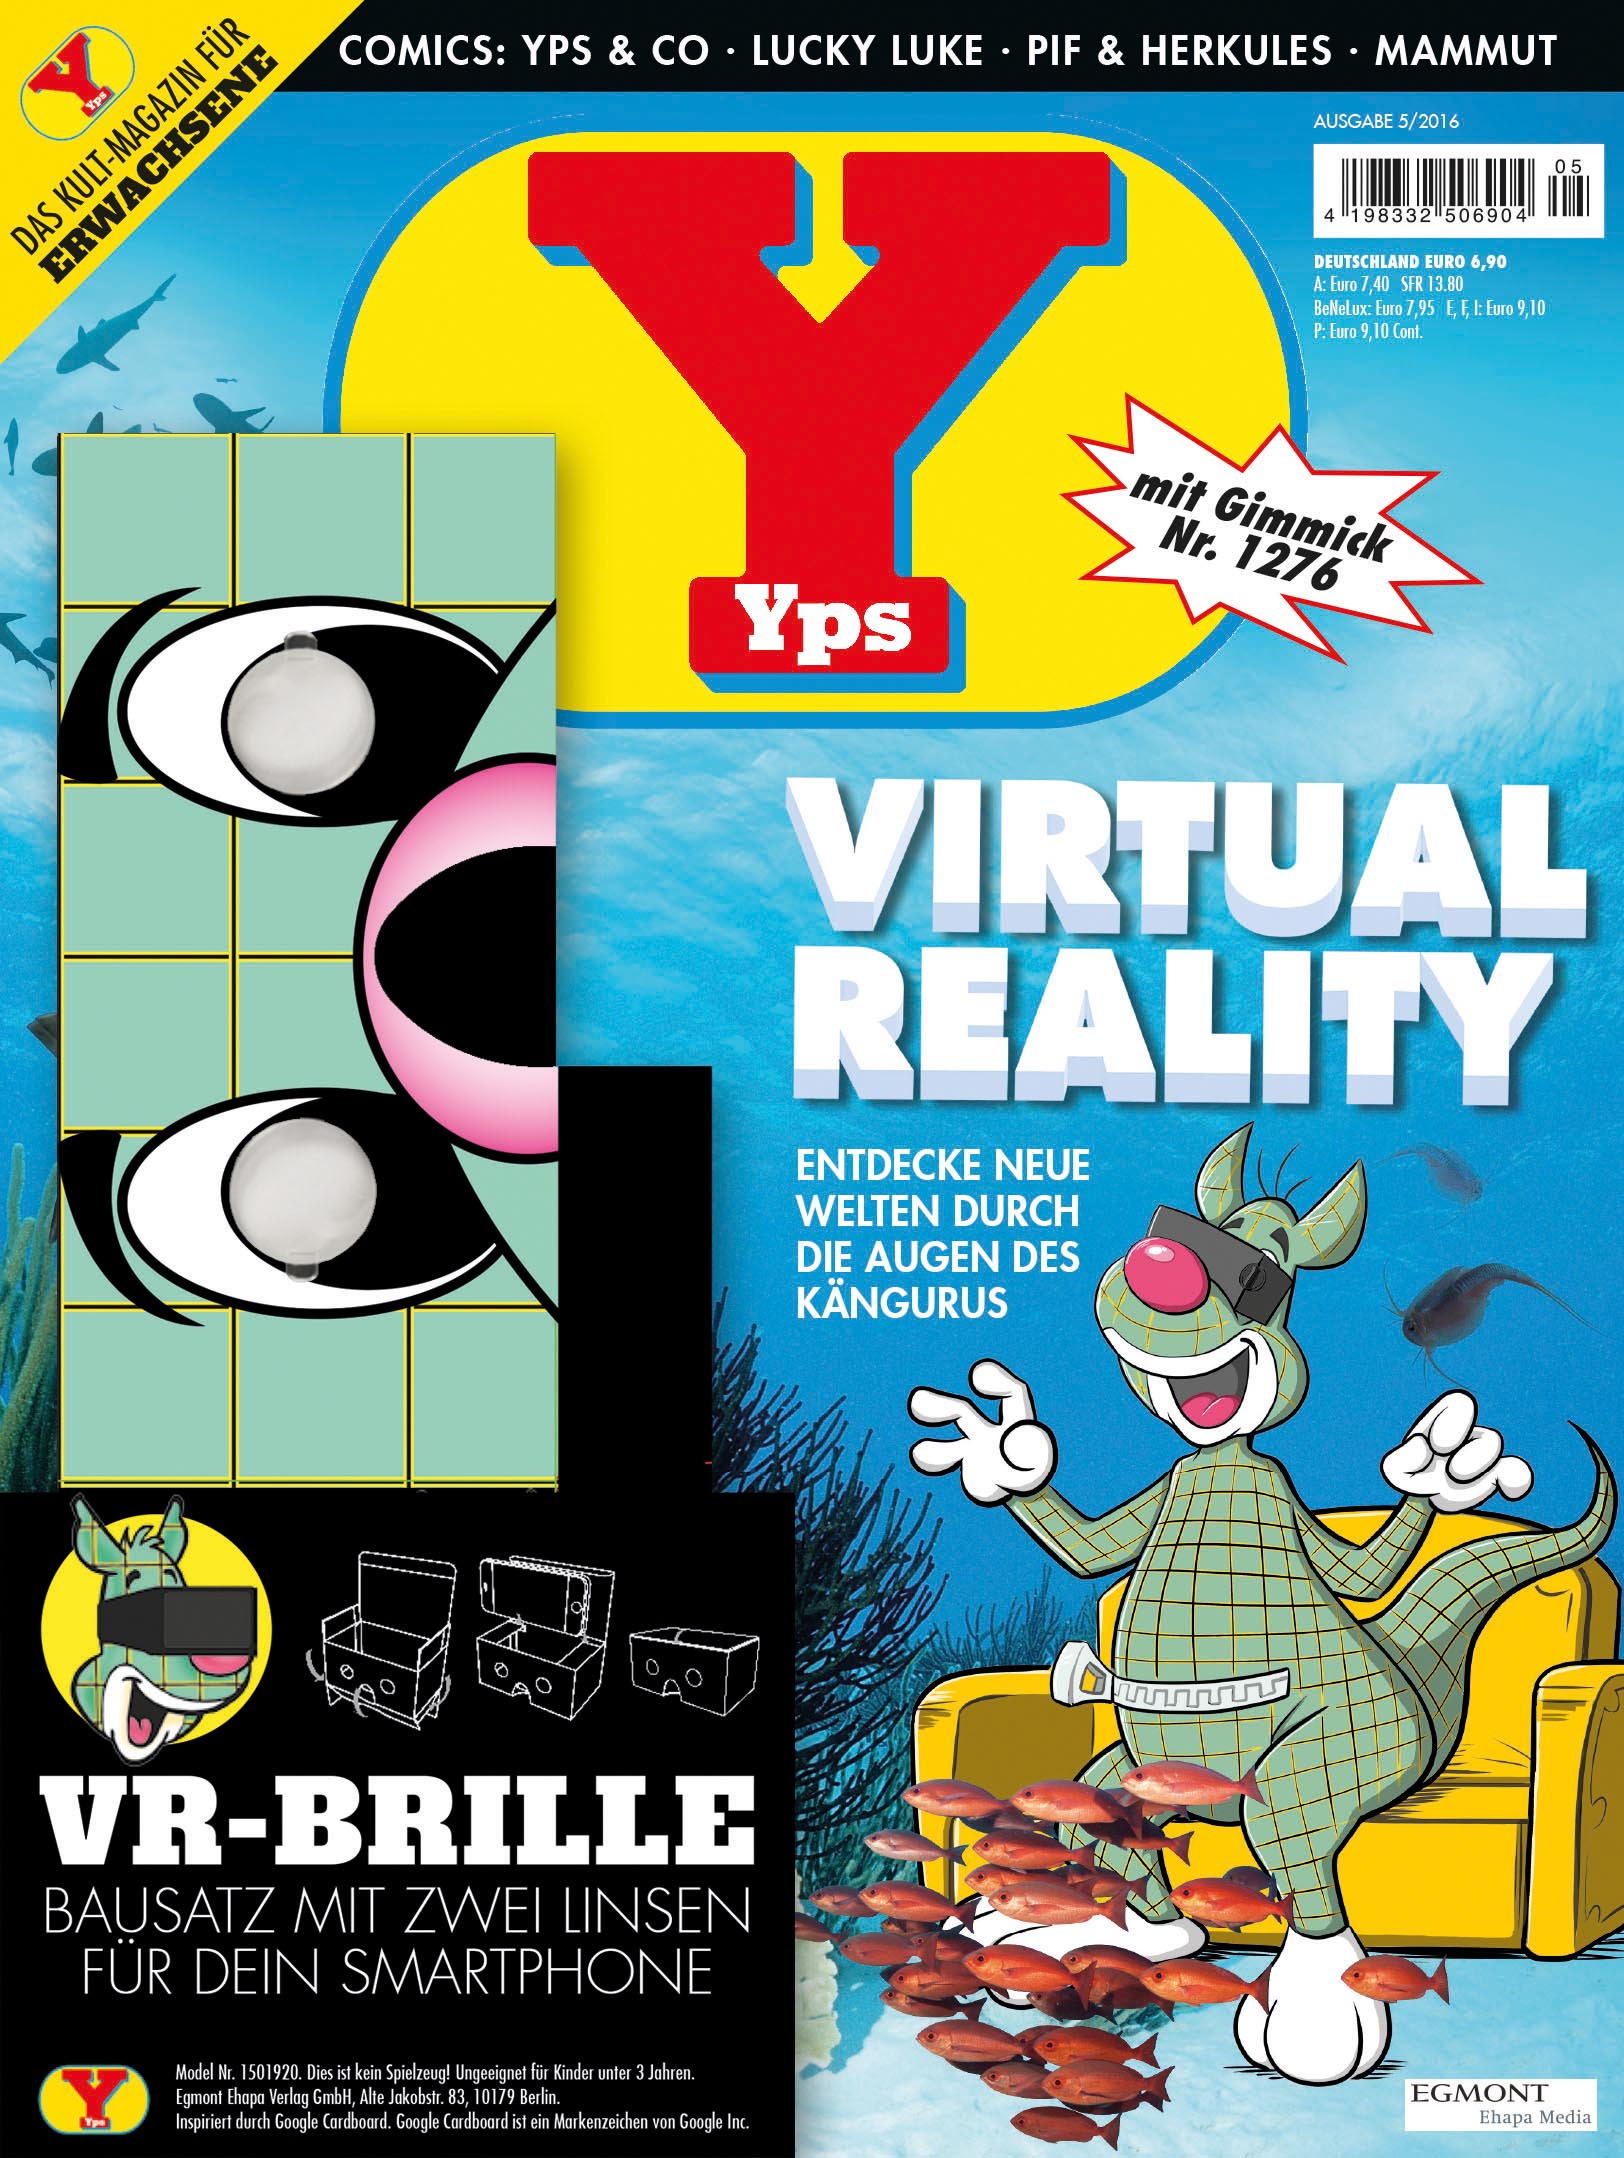 yps goes virtual reality pressemitteilung egmont ehapa media gmbh. Black Bedroom Furniture Sets. Home Design Ideas